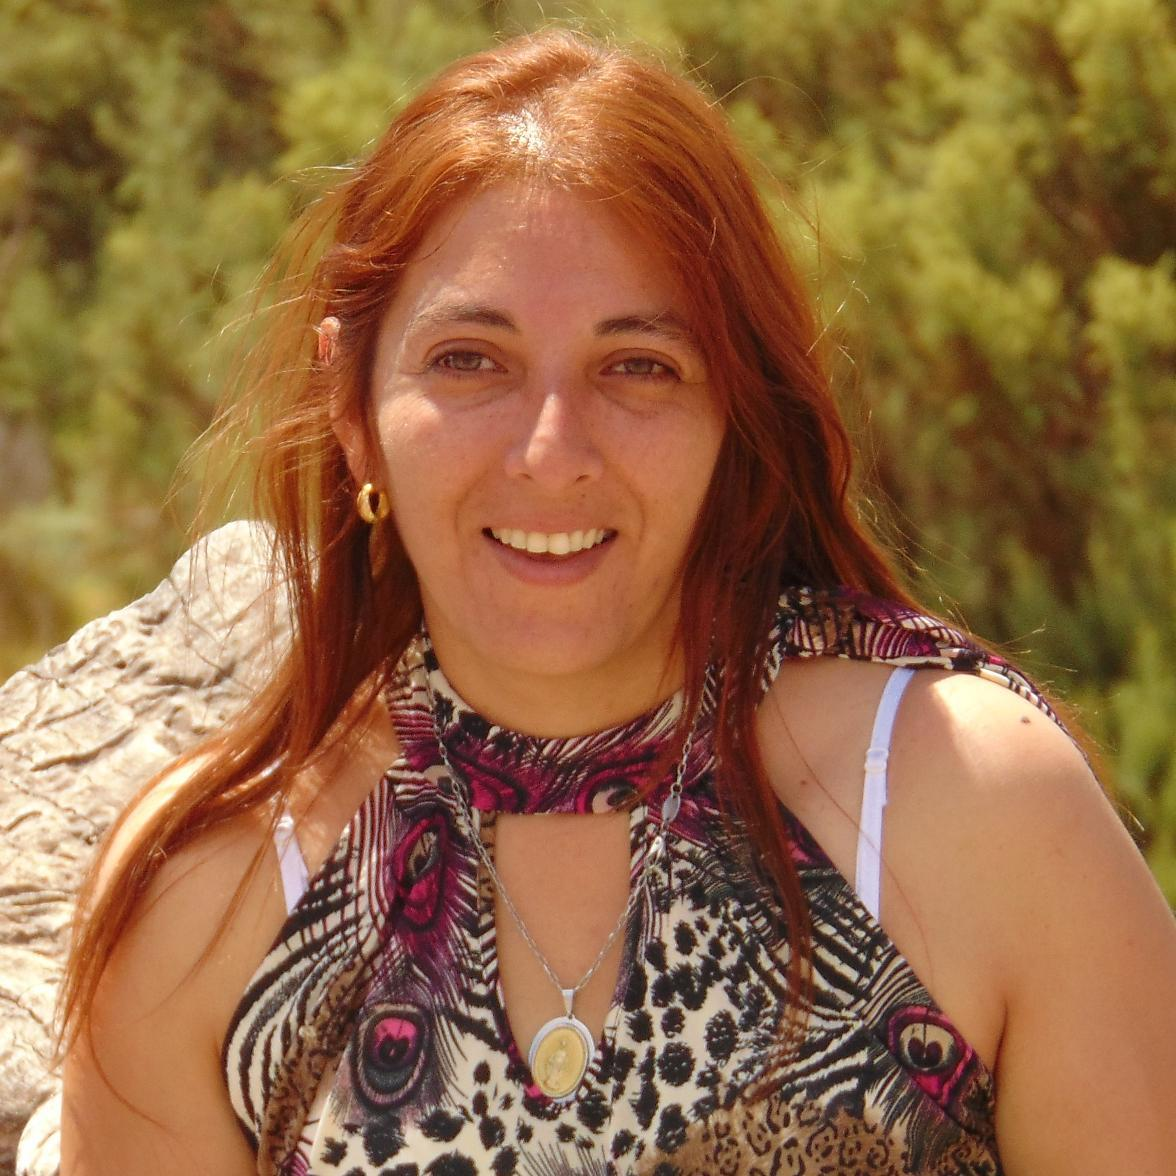 Natalia zeta desnuda pics 3